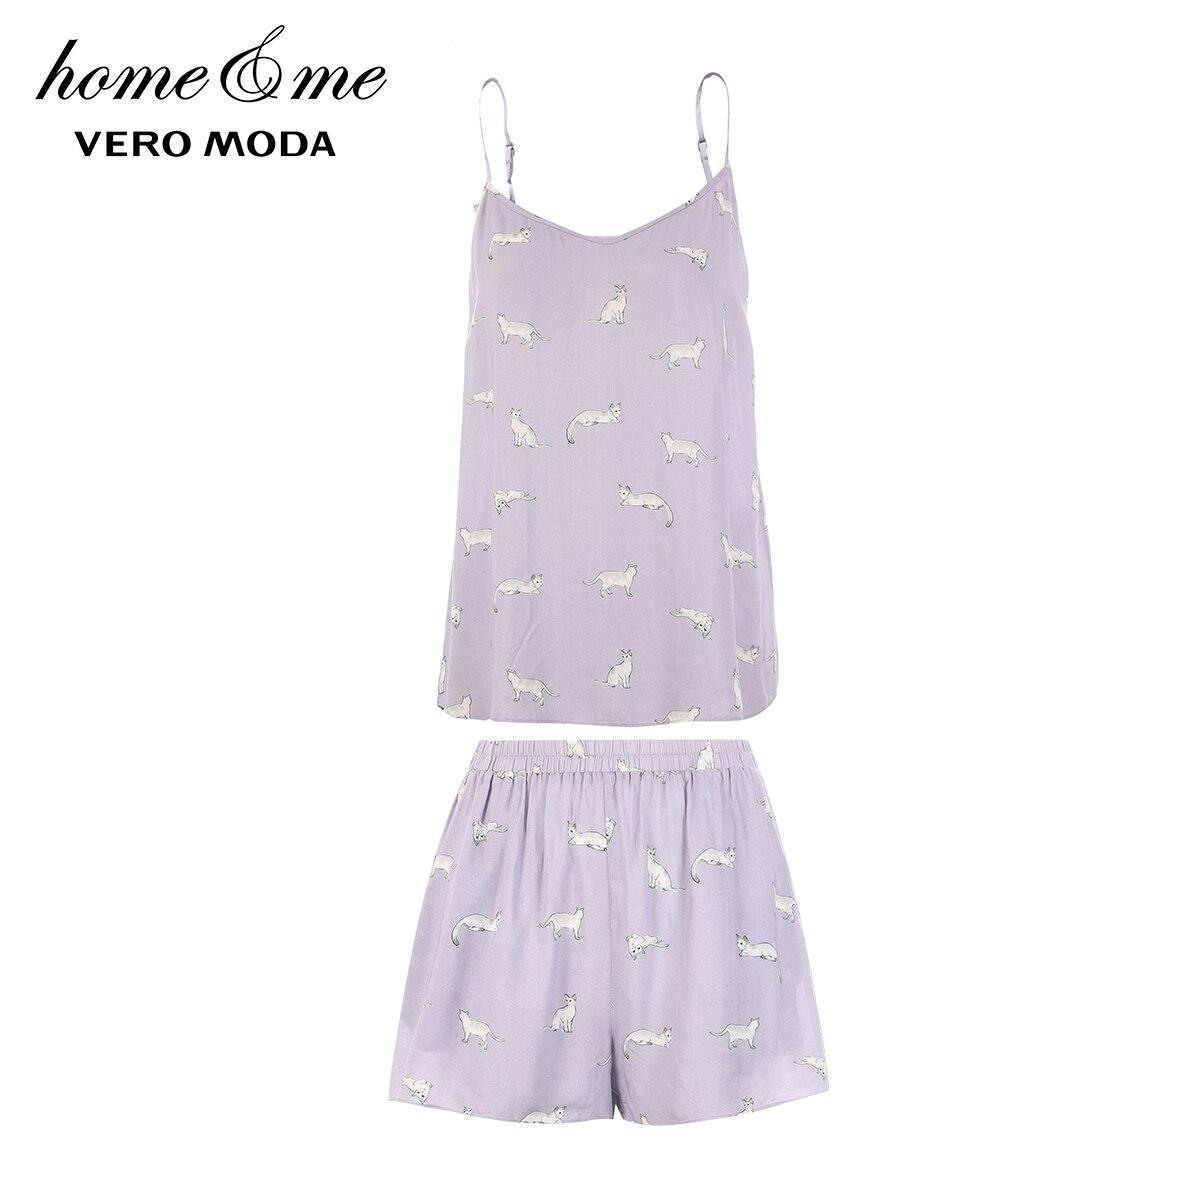 Image 5 - Vero Moda 2019 New Arrivals Cat Print Sun top Leisure Homewear Pajamas Set   3192TC505-in Pajama Sets from Underwear & Sleepwears